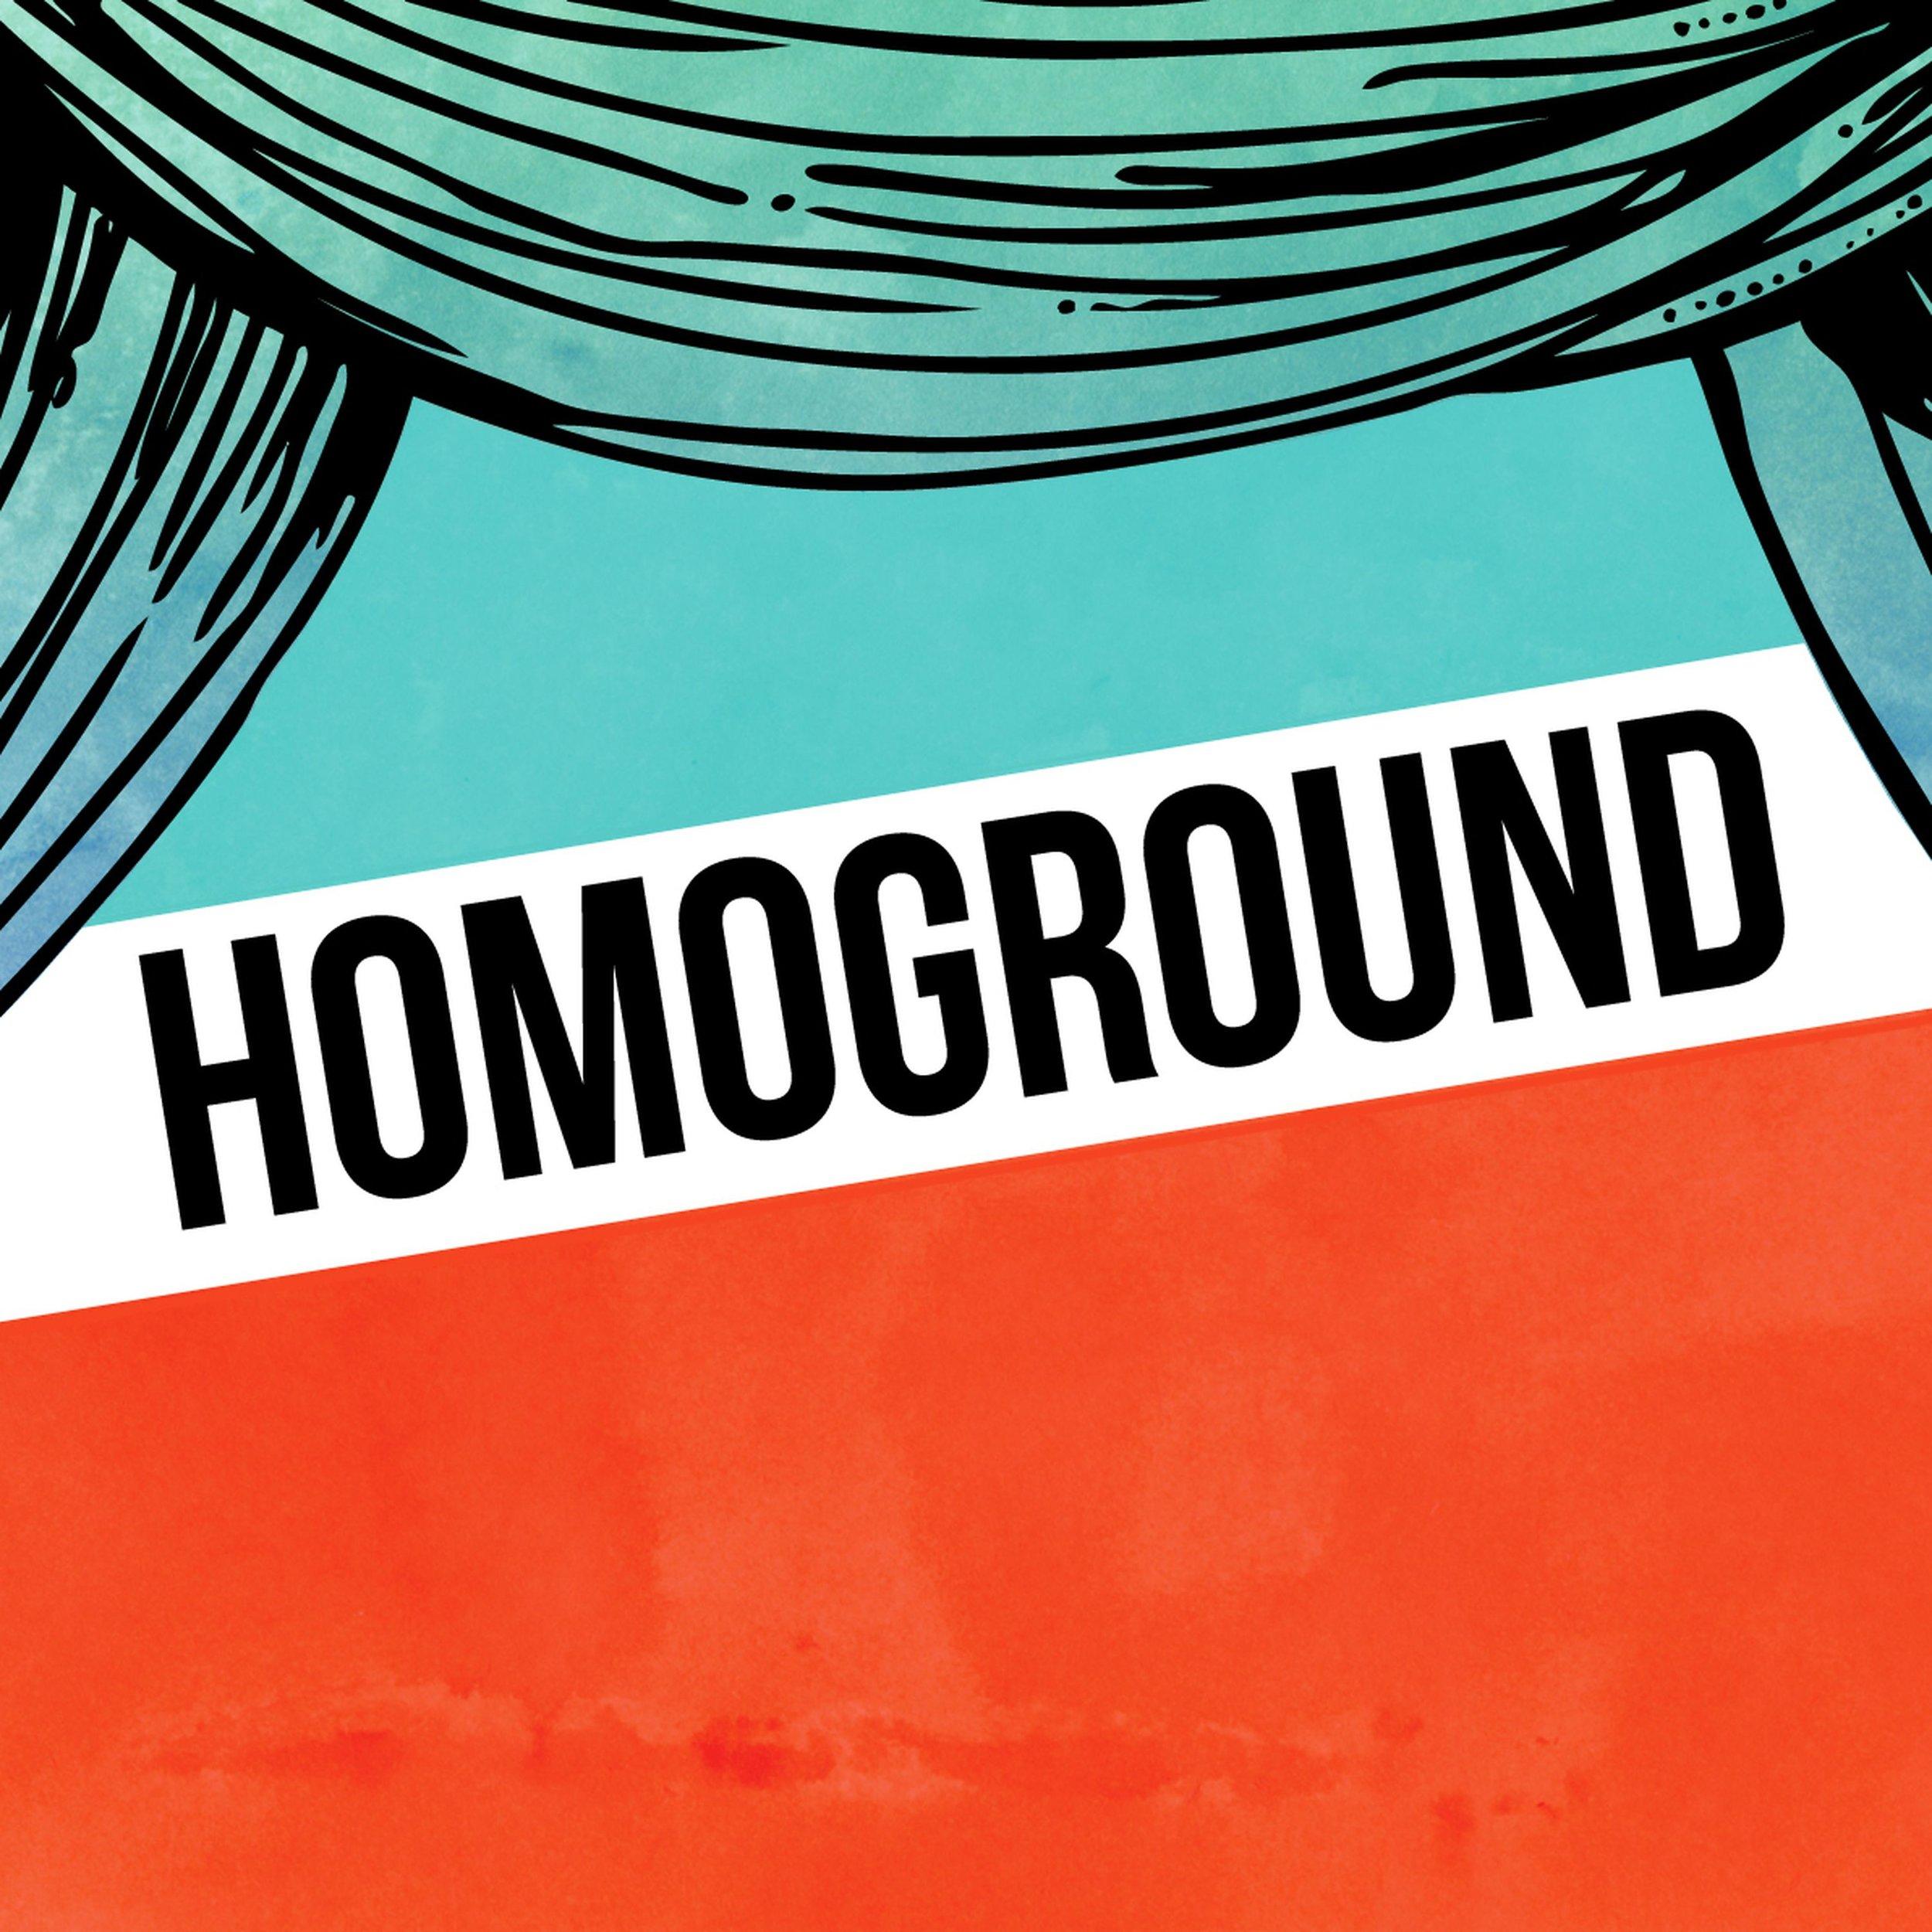 Tortas Golosa: Feminist/Lesbian Reggaeton for Homoground -